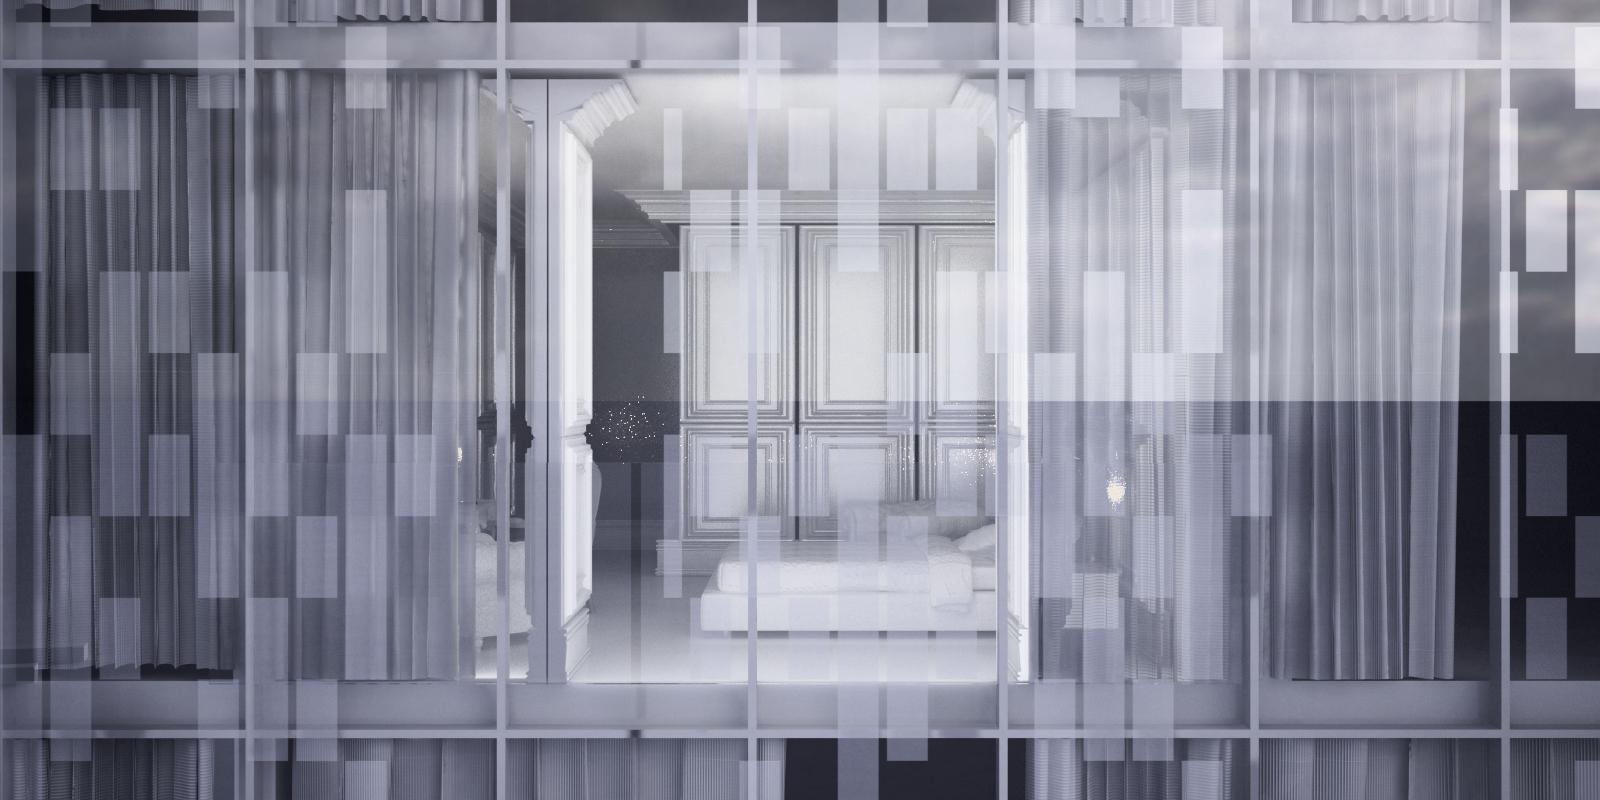 CNE Hotel - window exterior bedroom blinds